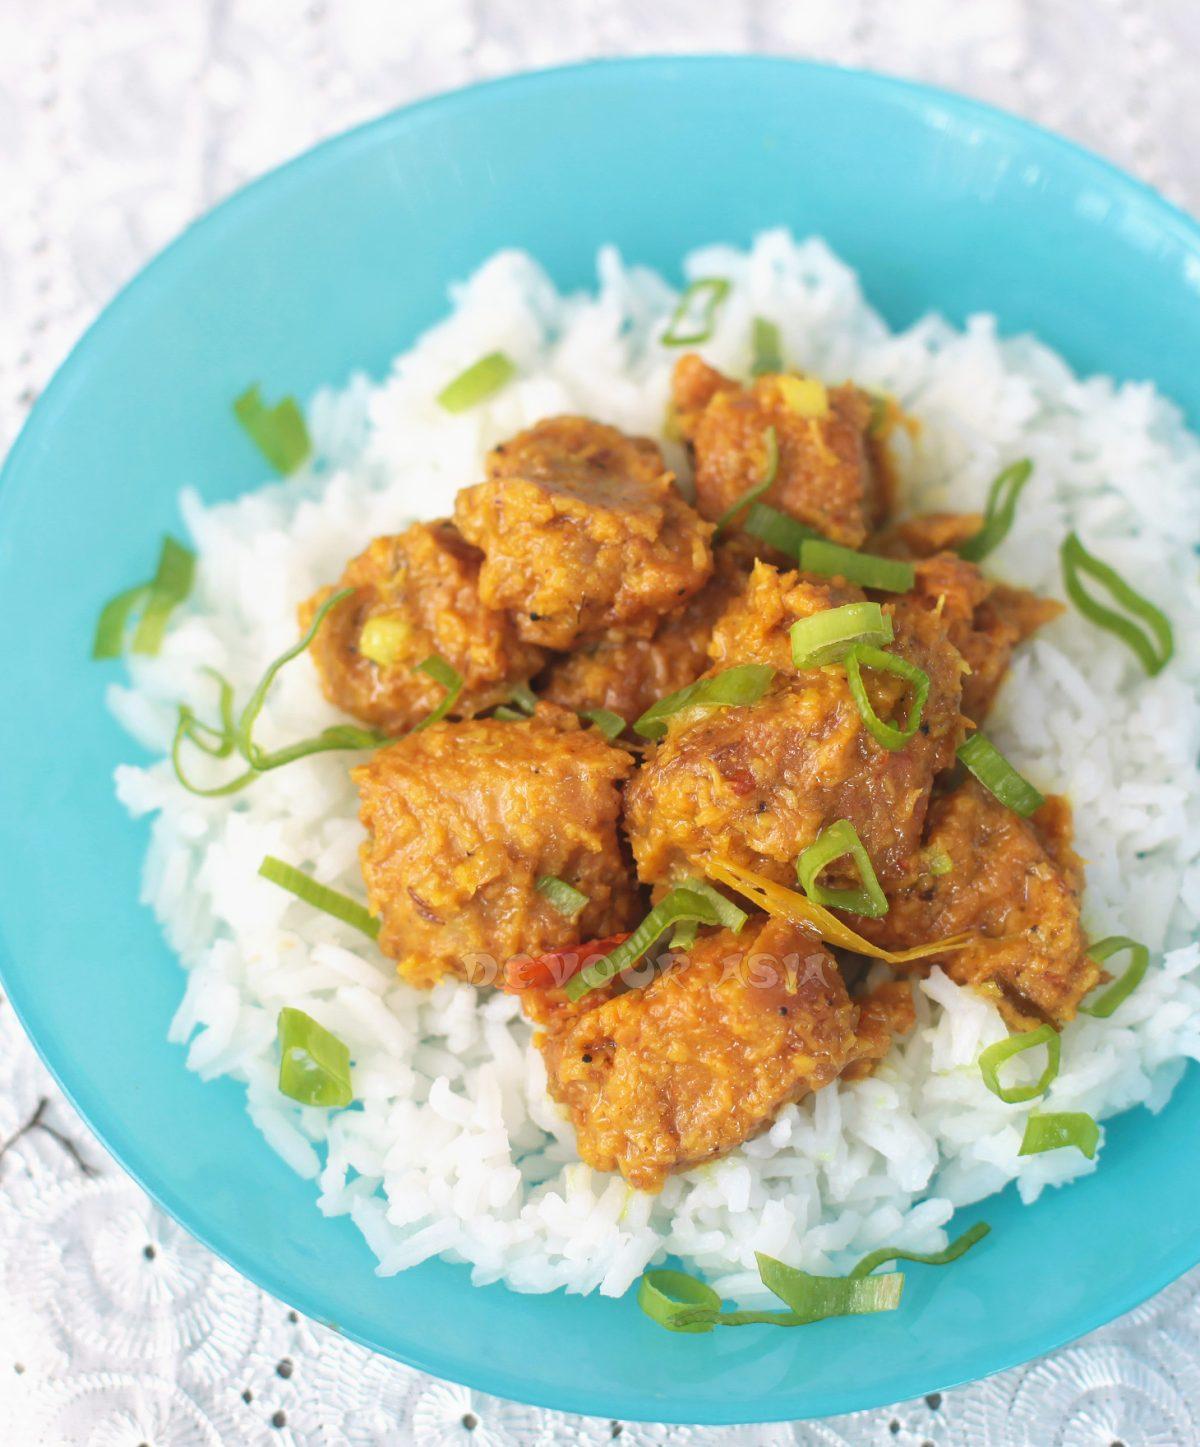 Pork rendang over rice in blue bowl